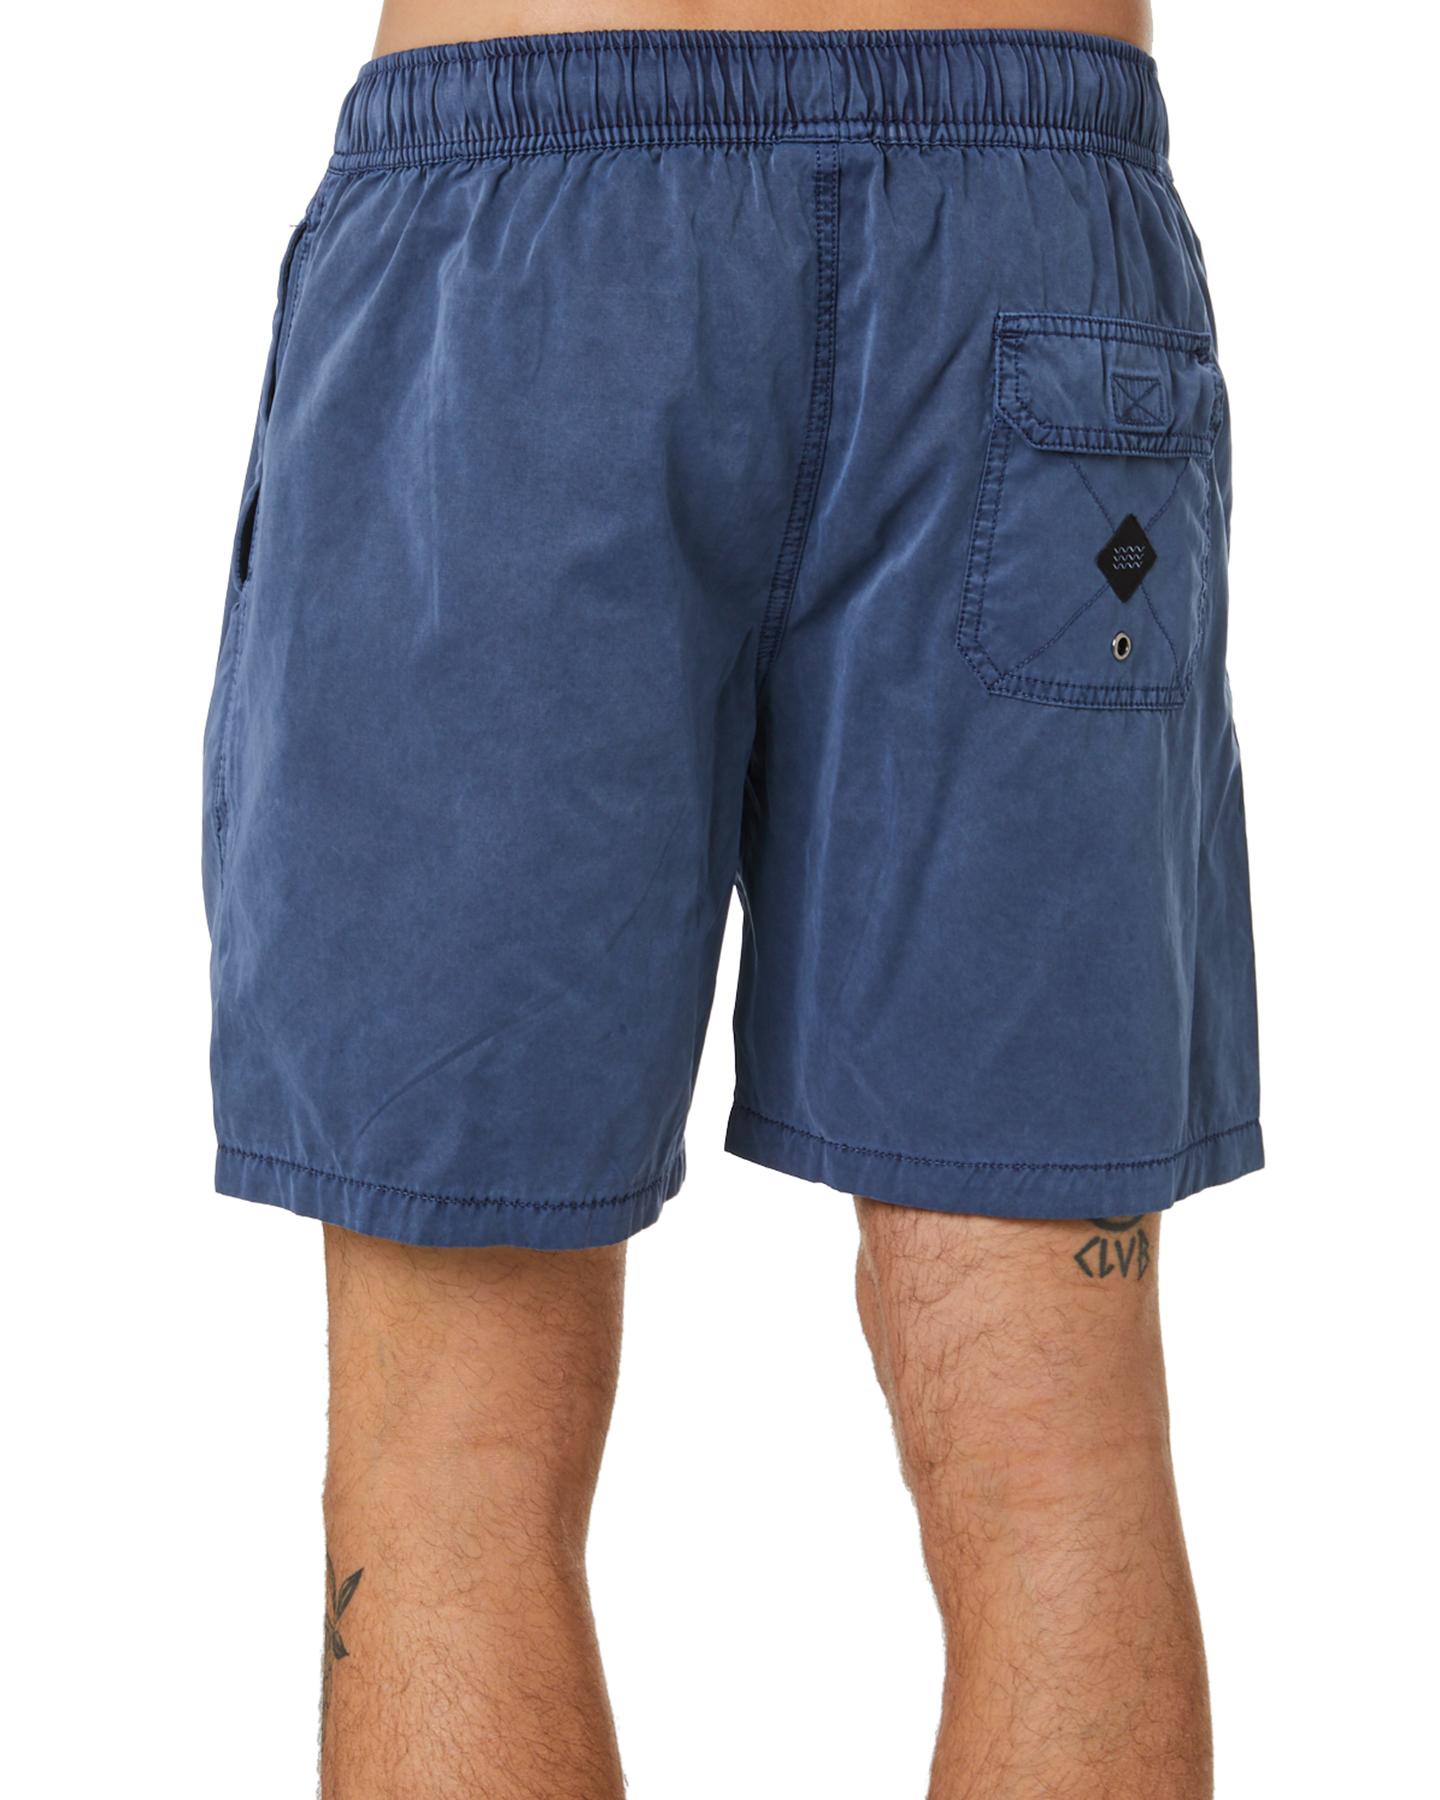 New-Swell-Men-039-s-Malibu-Mens-Beach-Short-Cotton-Polyester-Grey thumbnail 26